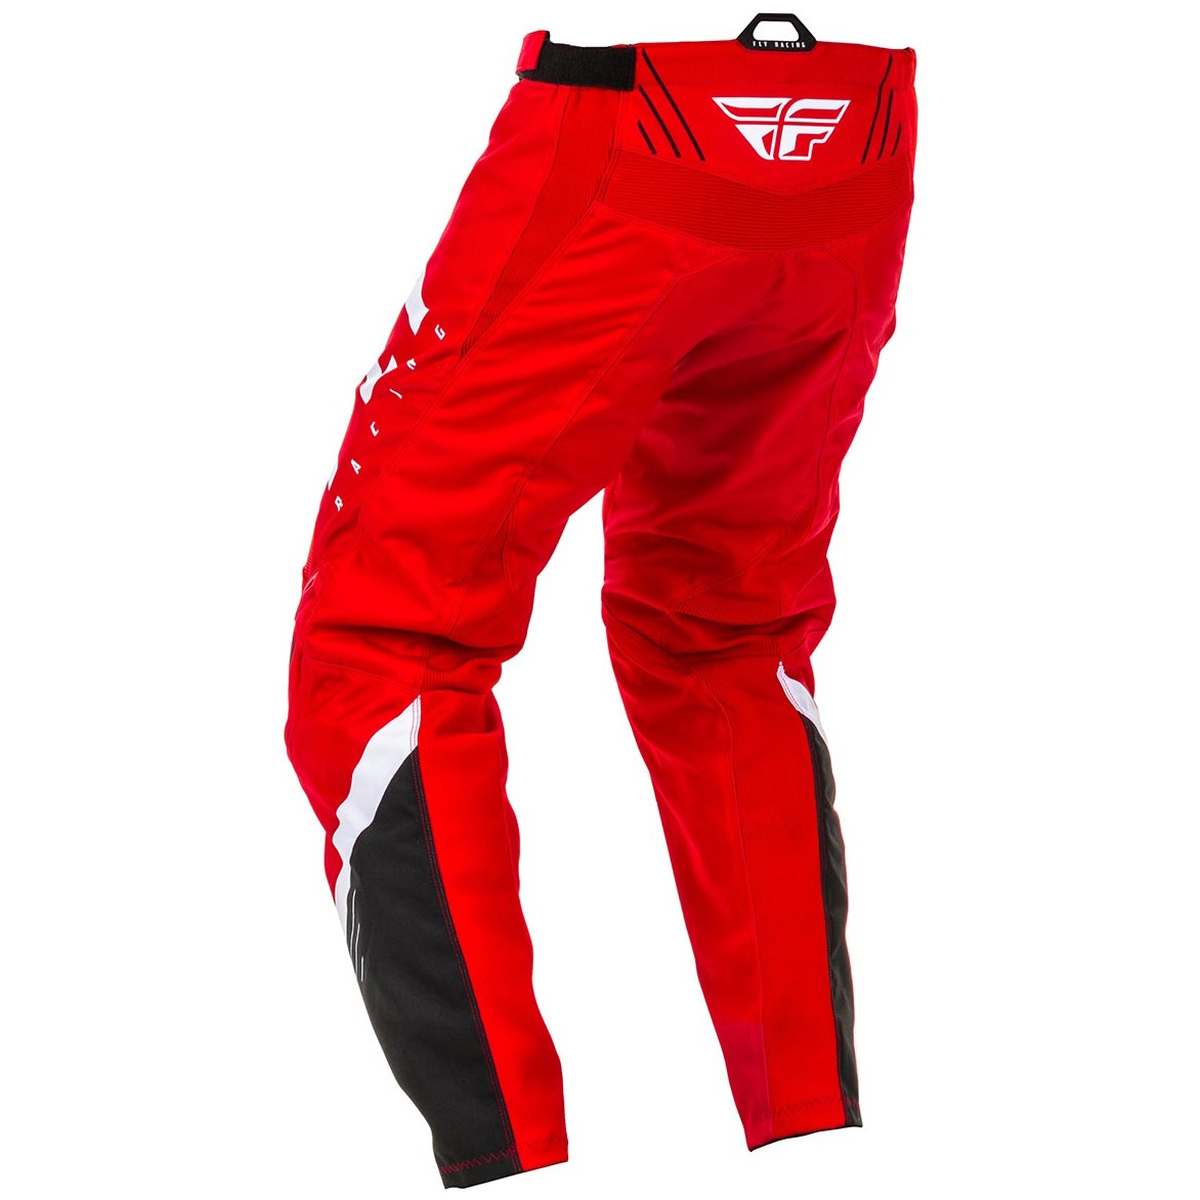 FLY RACING F-16 MOTOCROSS PANTS DIRTBIKE ATV RED BLK